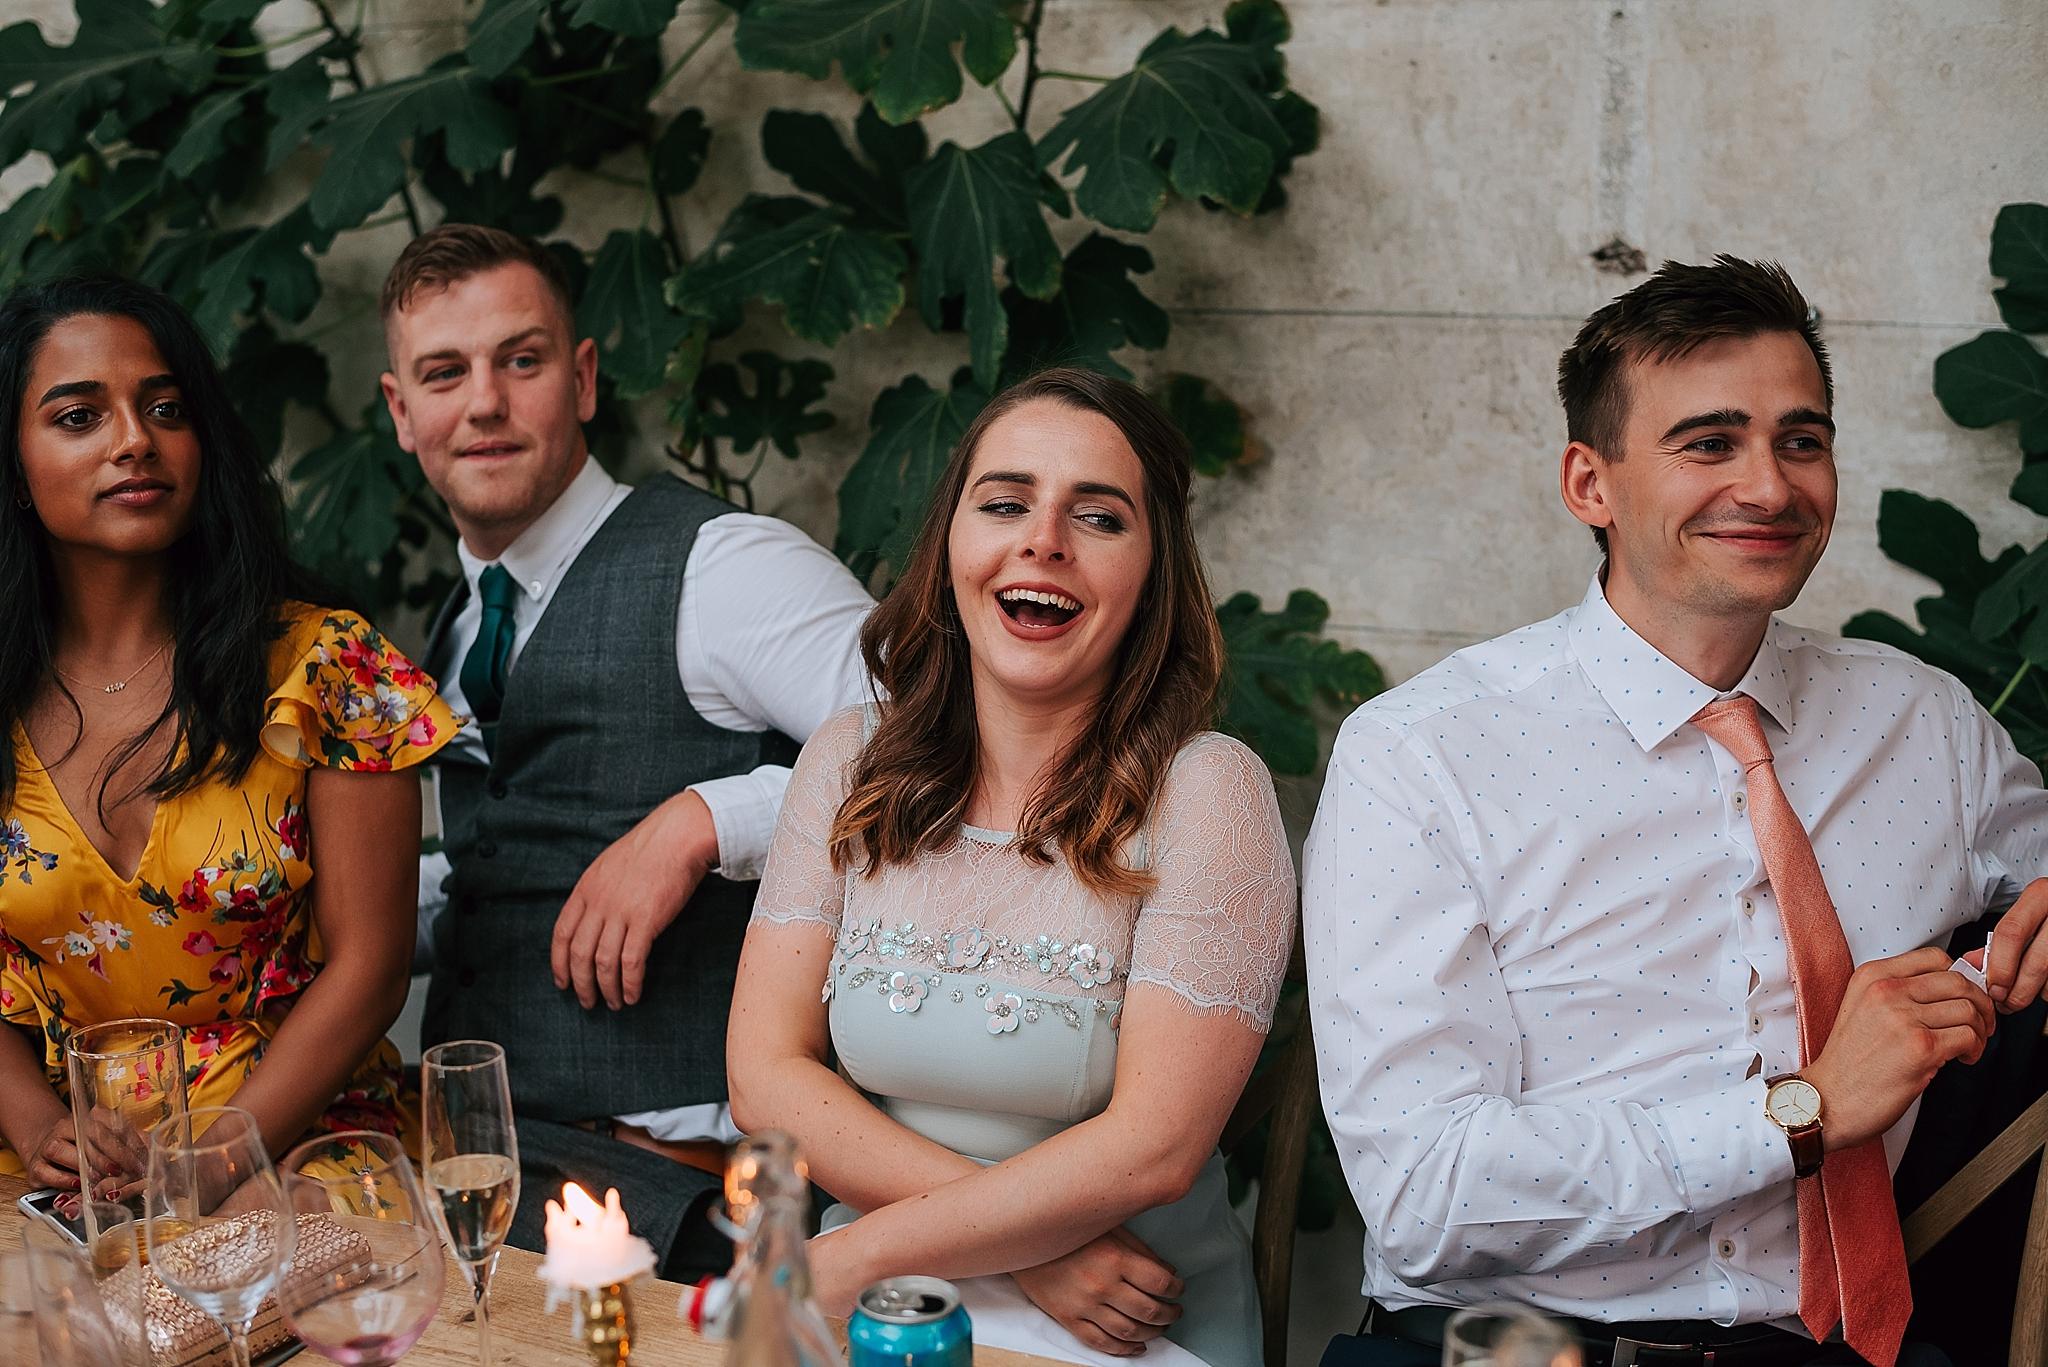 Enjoying the wedding speeches at rustic wedding venue near darlington